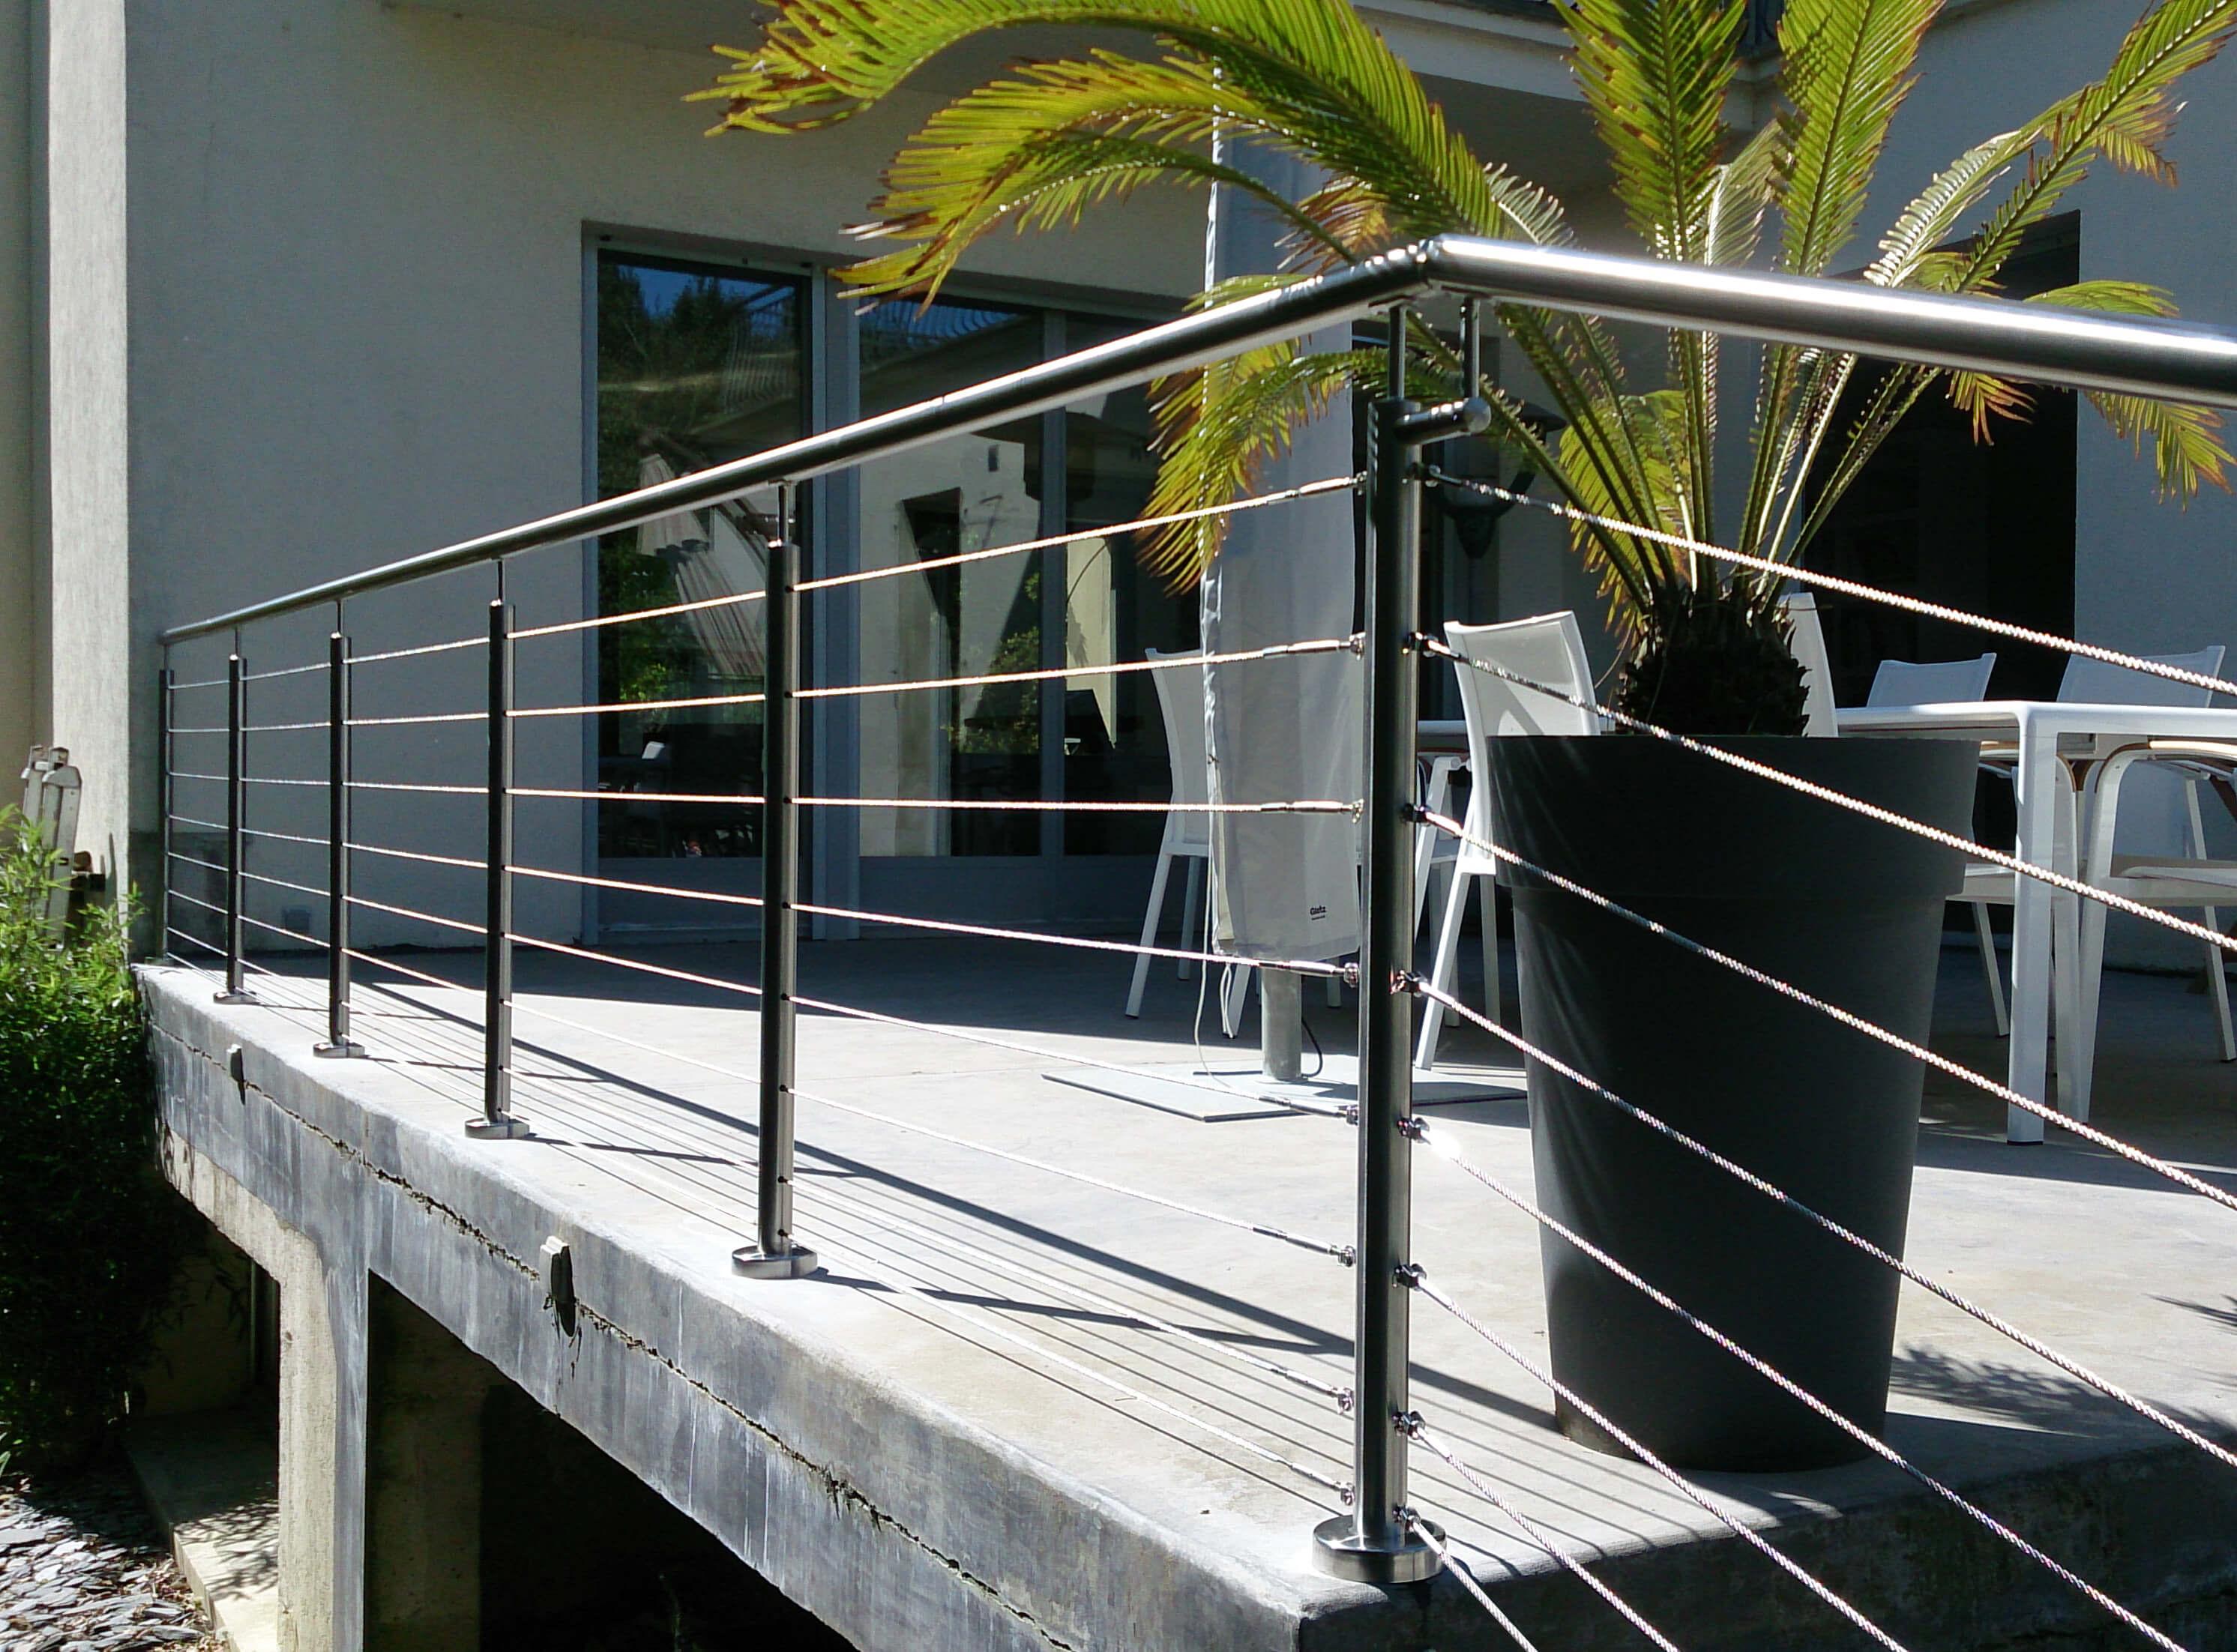 fabricant garde corps aluminium inox. Black Bedroom Furniture Sets. Home Design Ideas